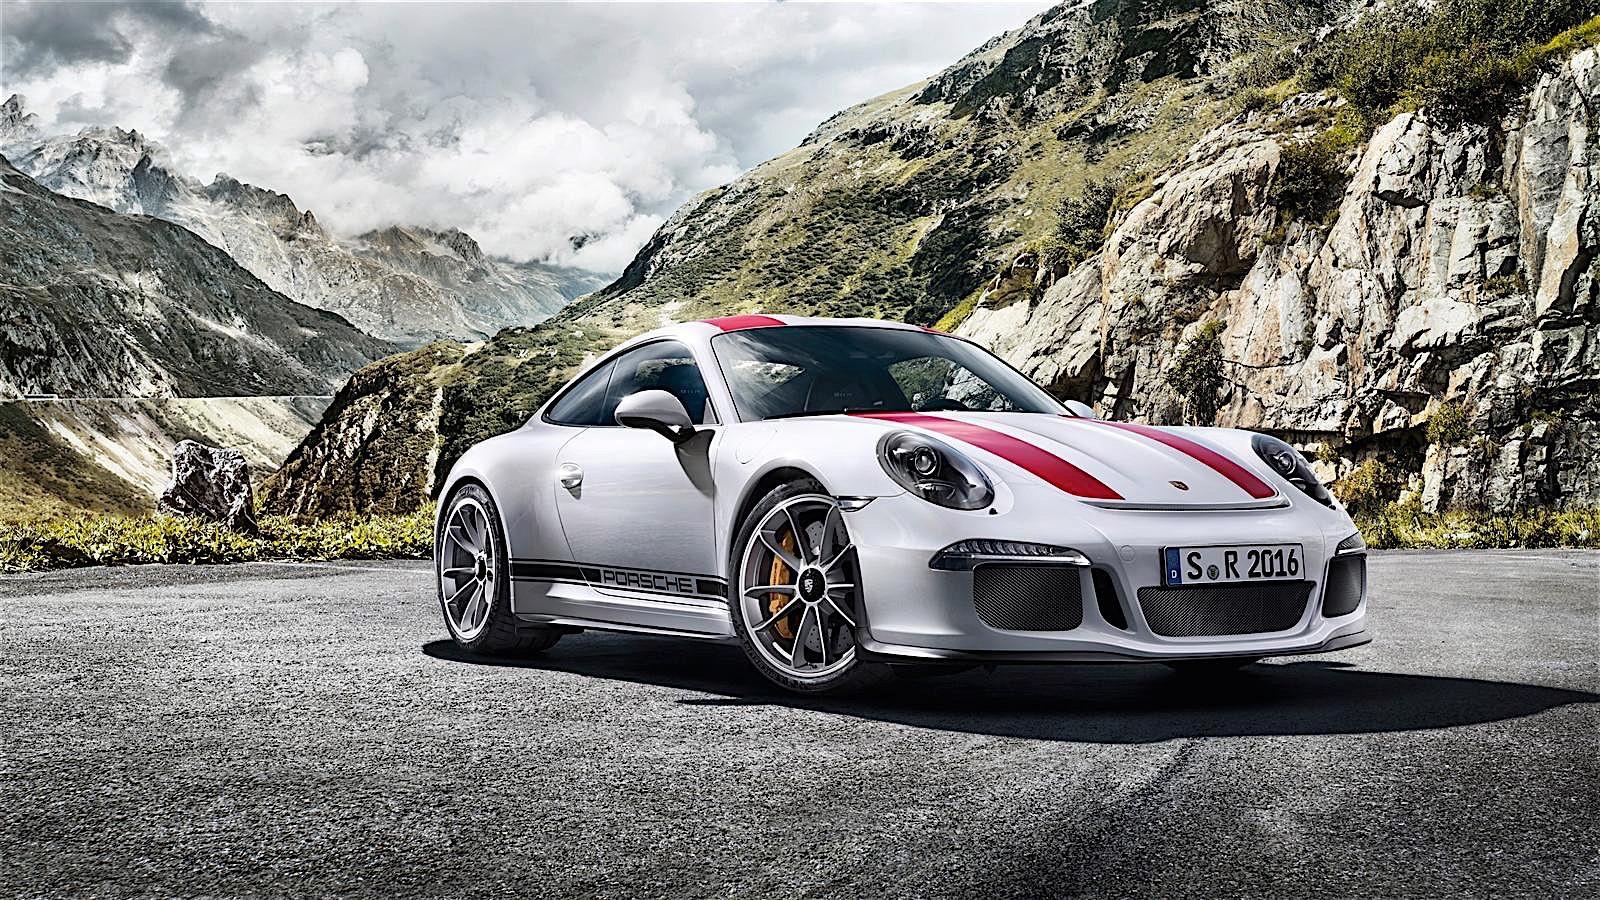 911 porsche cars 2021 autoevolution present specs